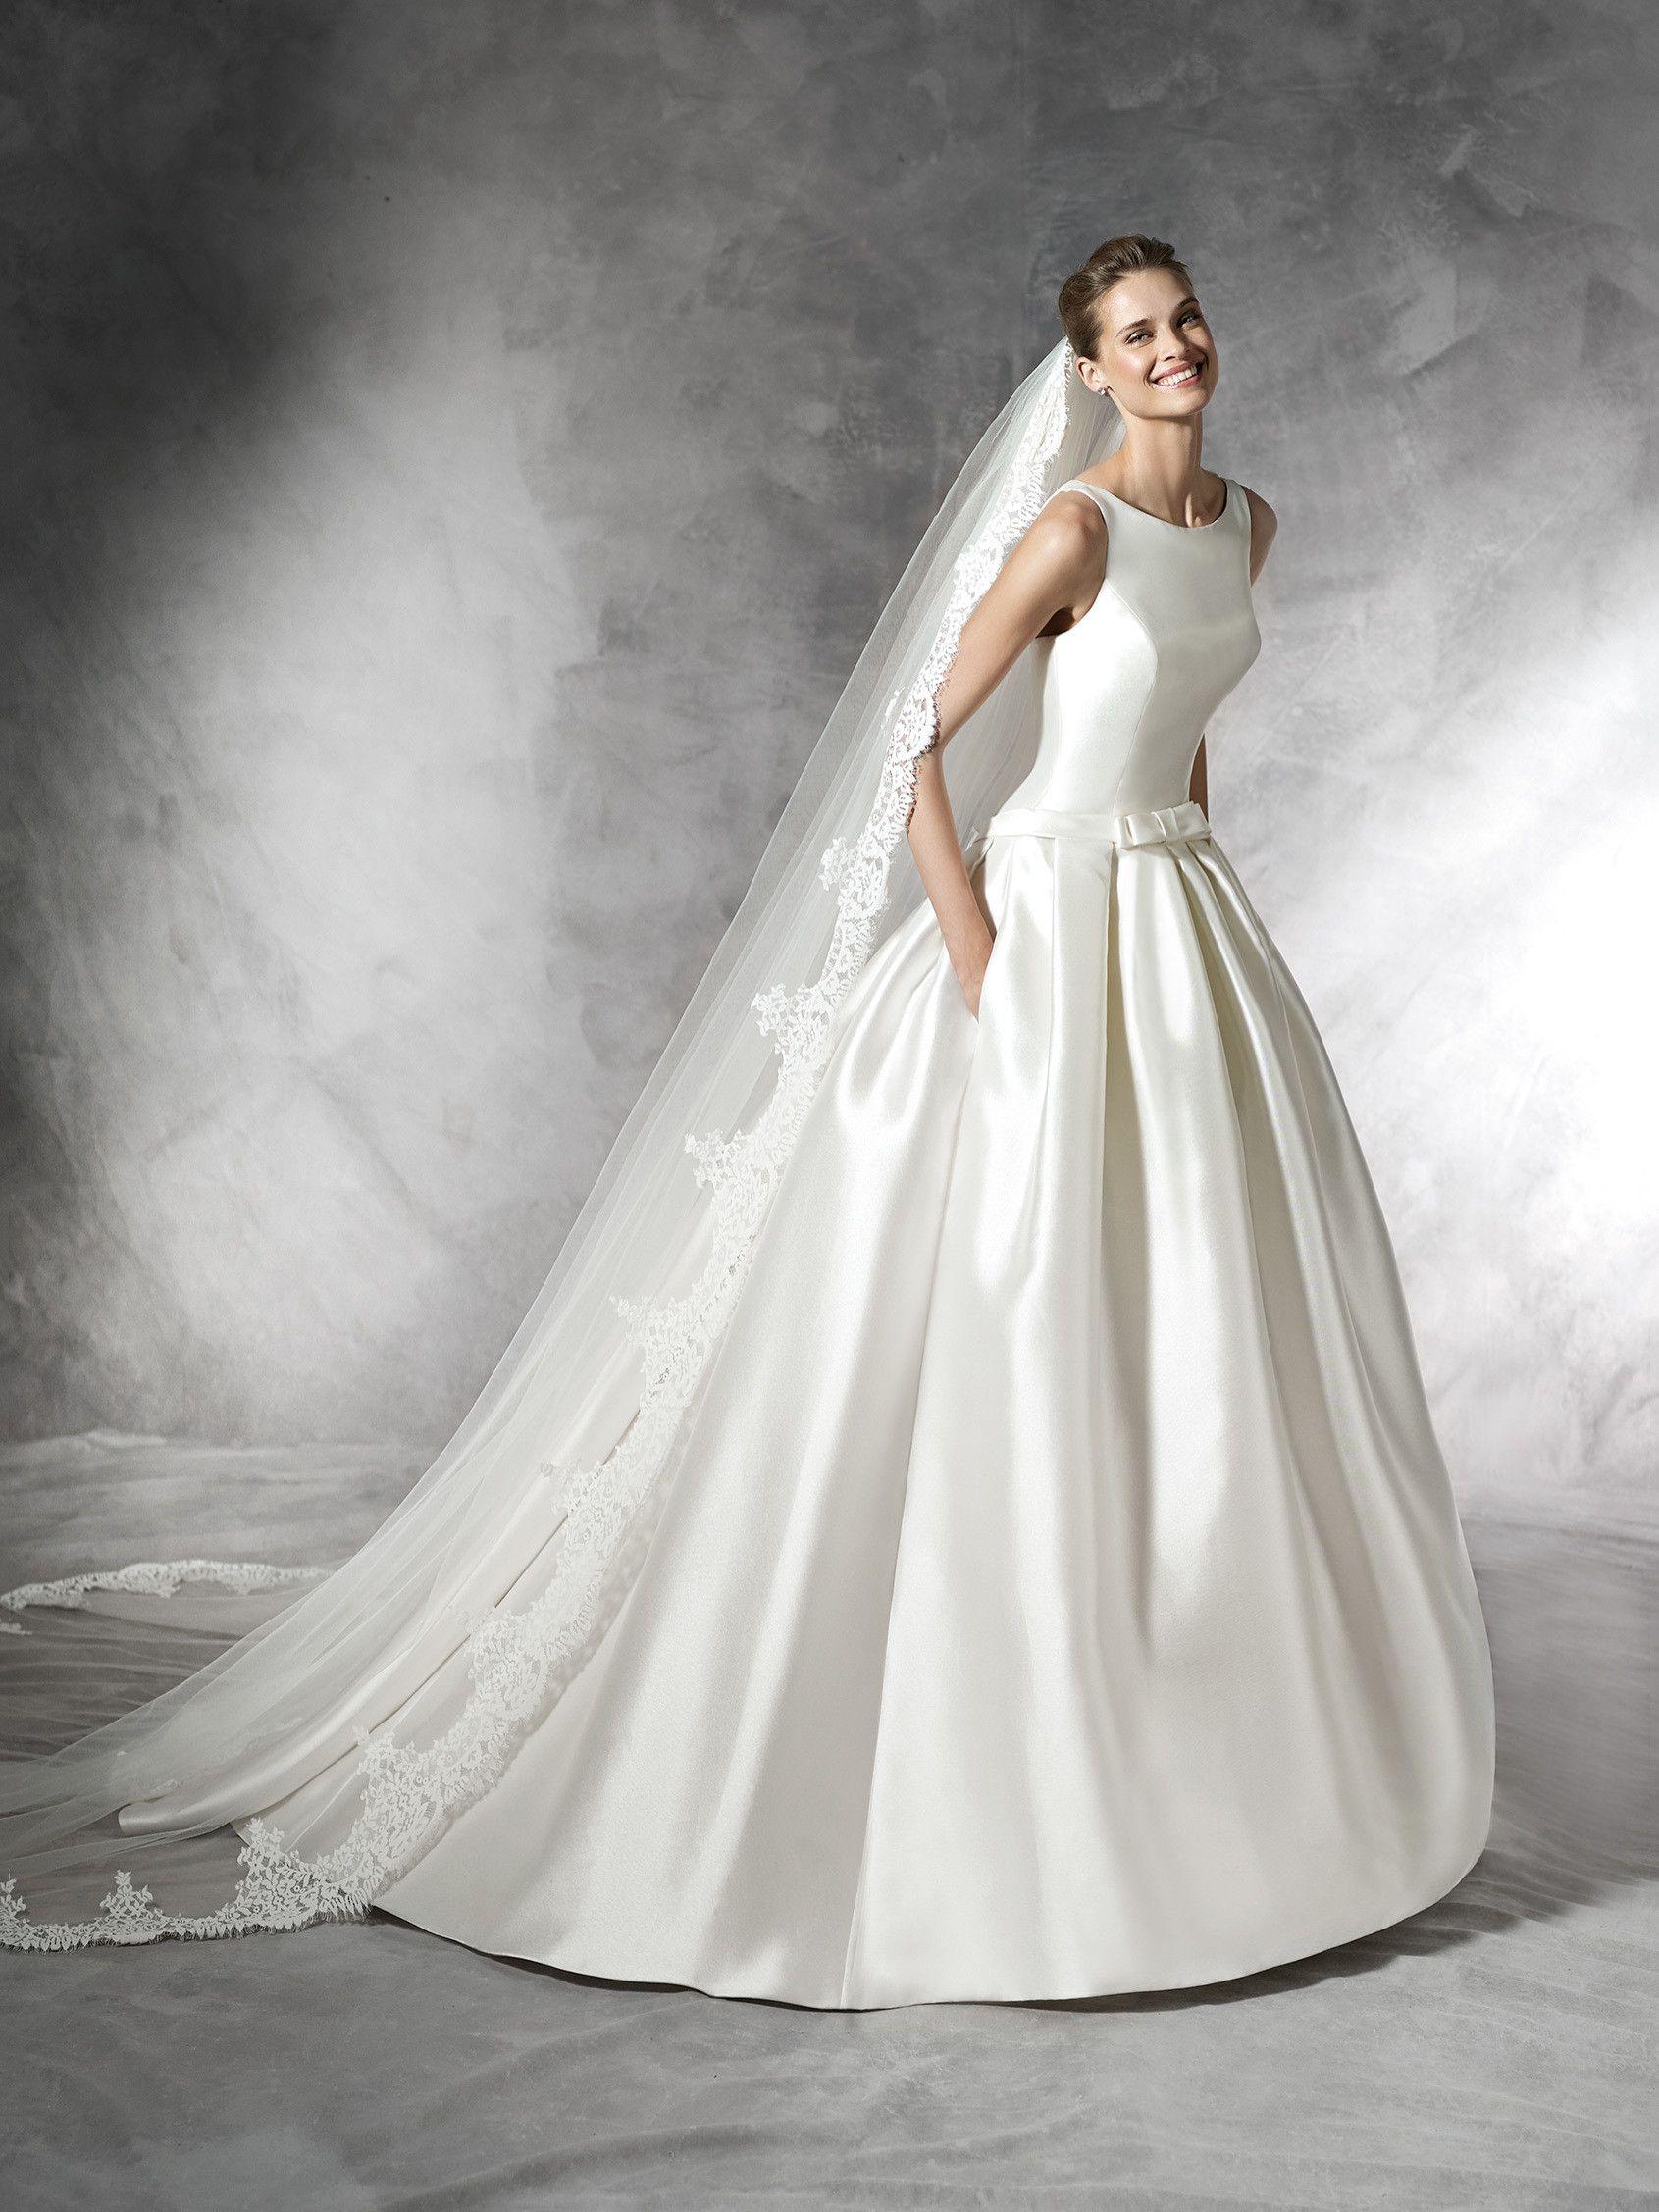 BARCAZA - Princess style wedding dress | Dresses | Pinterest ...